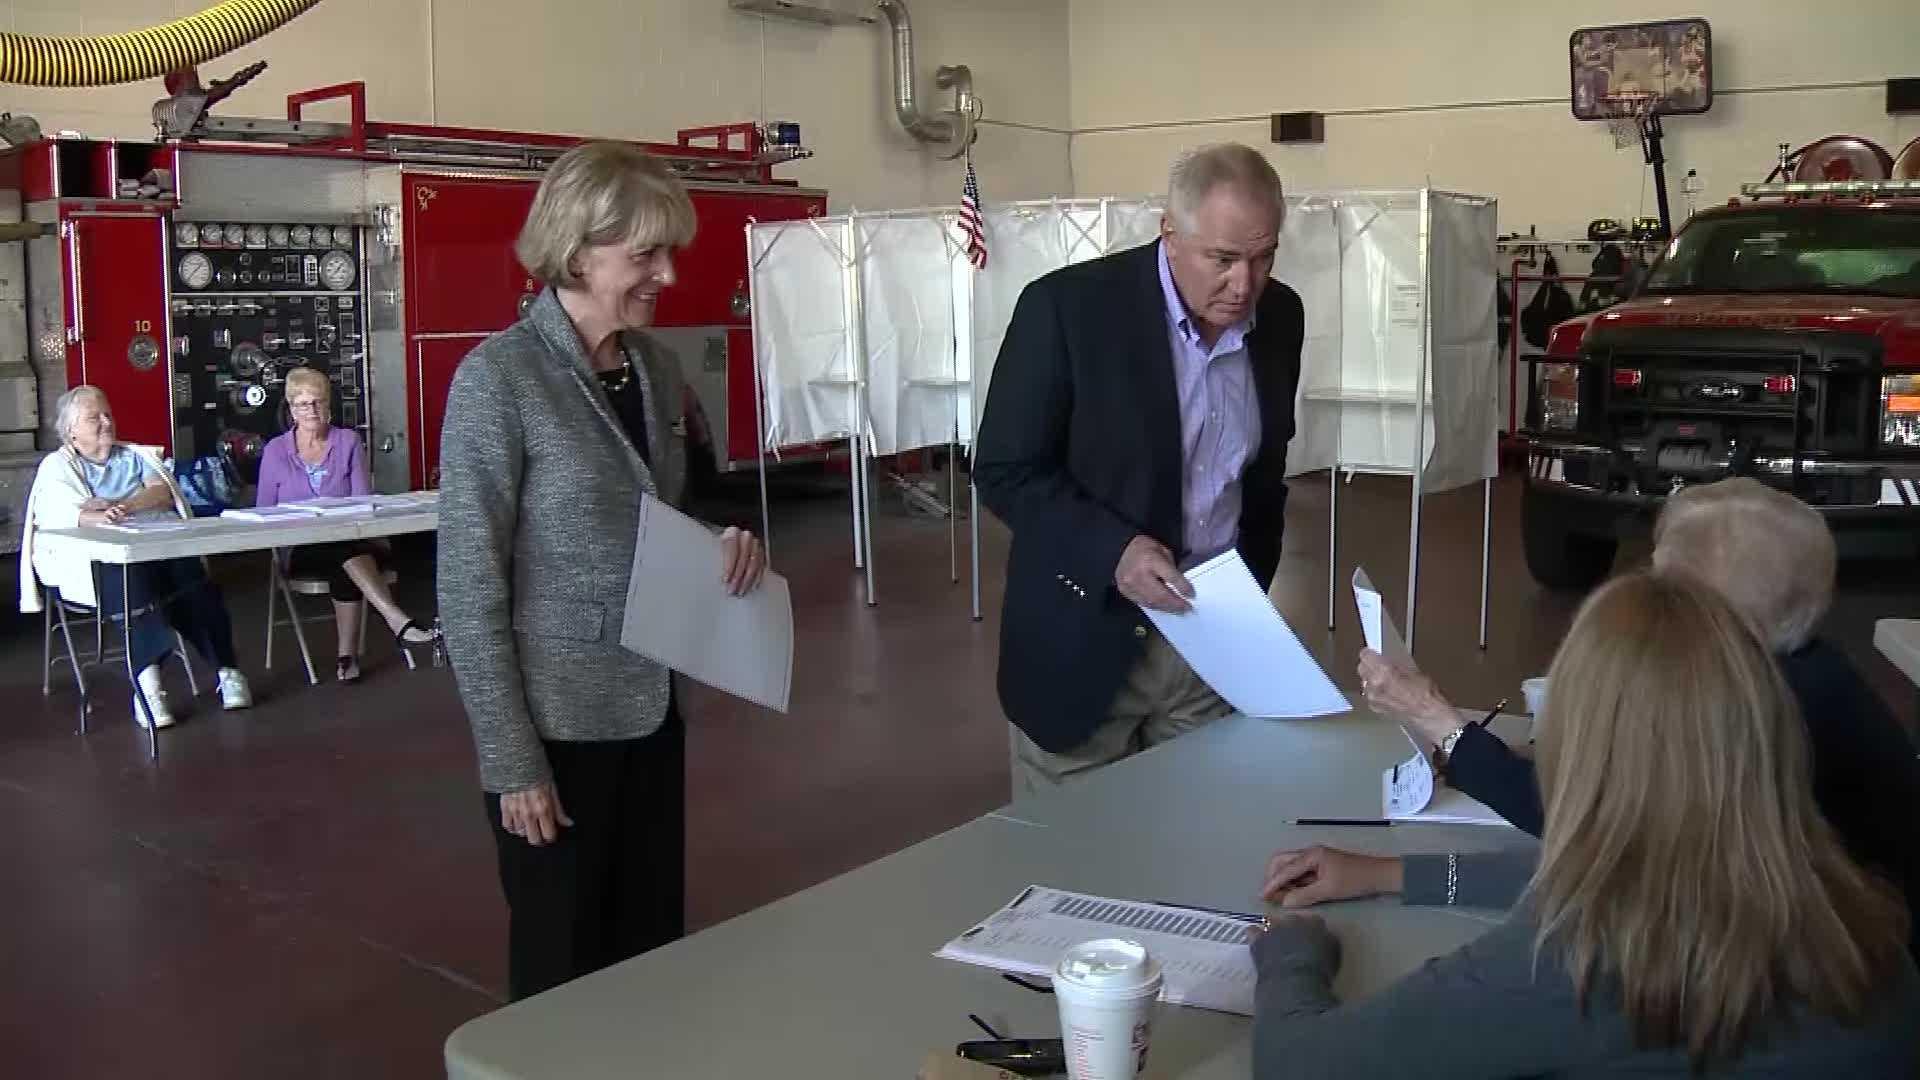 Attorney General Martha Coakley, who hopes to succeed Gov. Deval Patrick, voted in Medford.